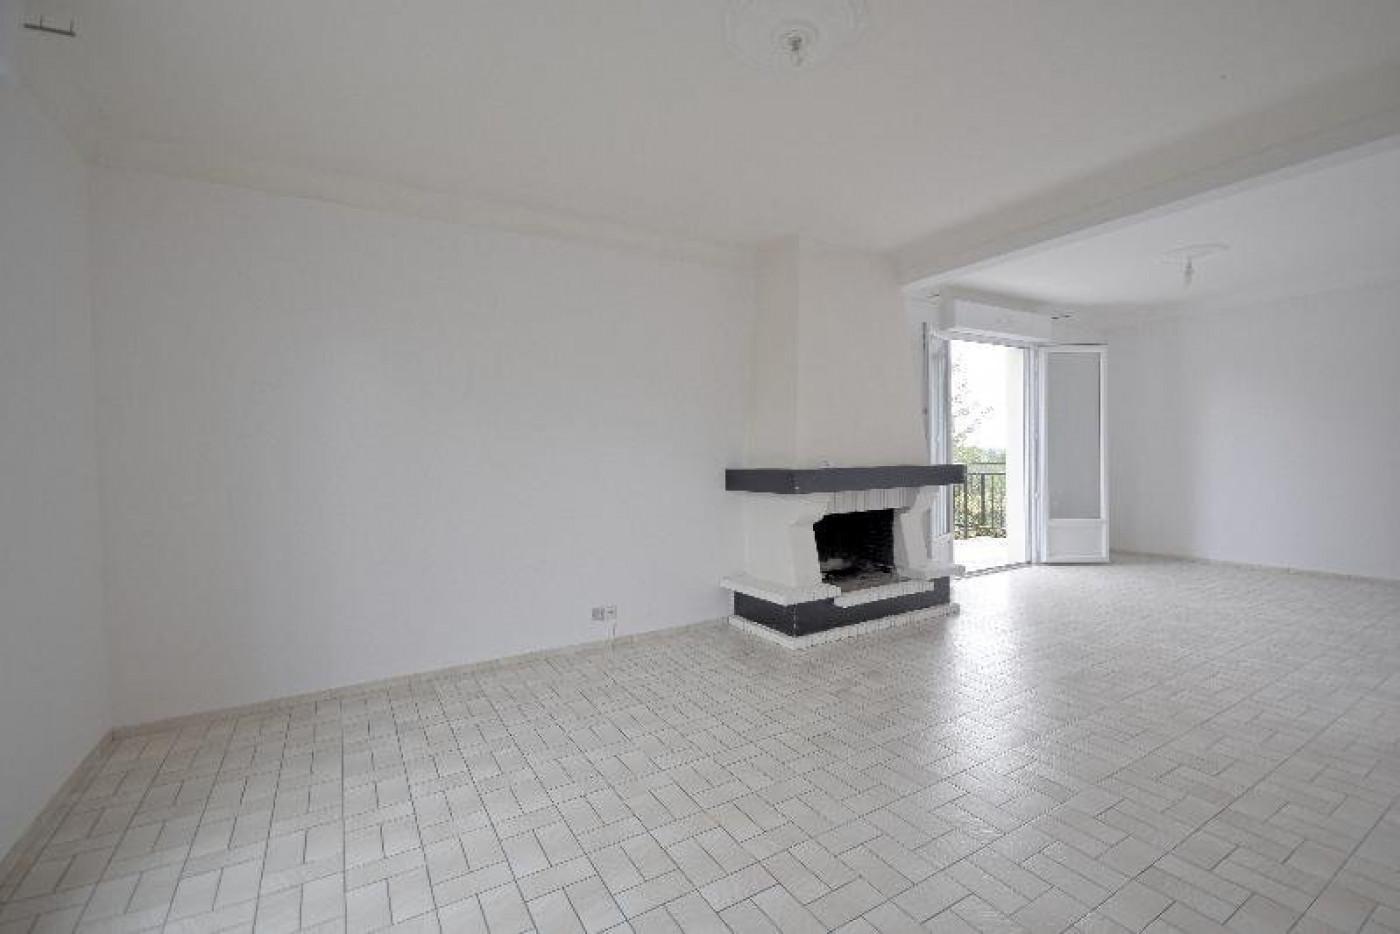 A vendre Chateaubriant 44015168 Agence porte neuve immobilier